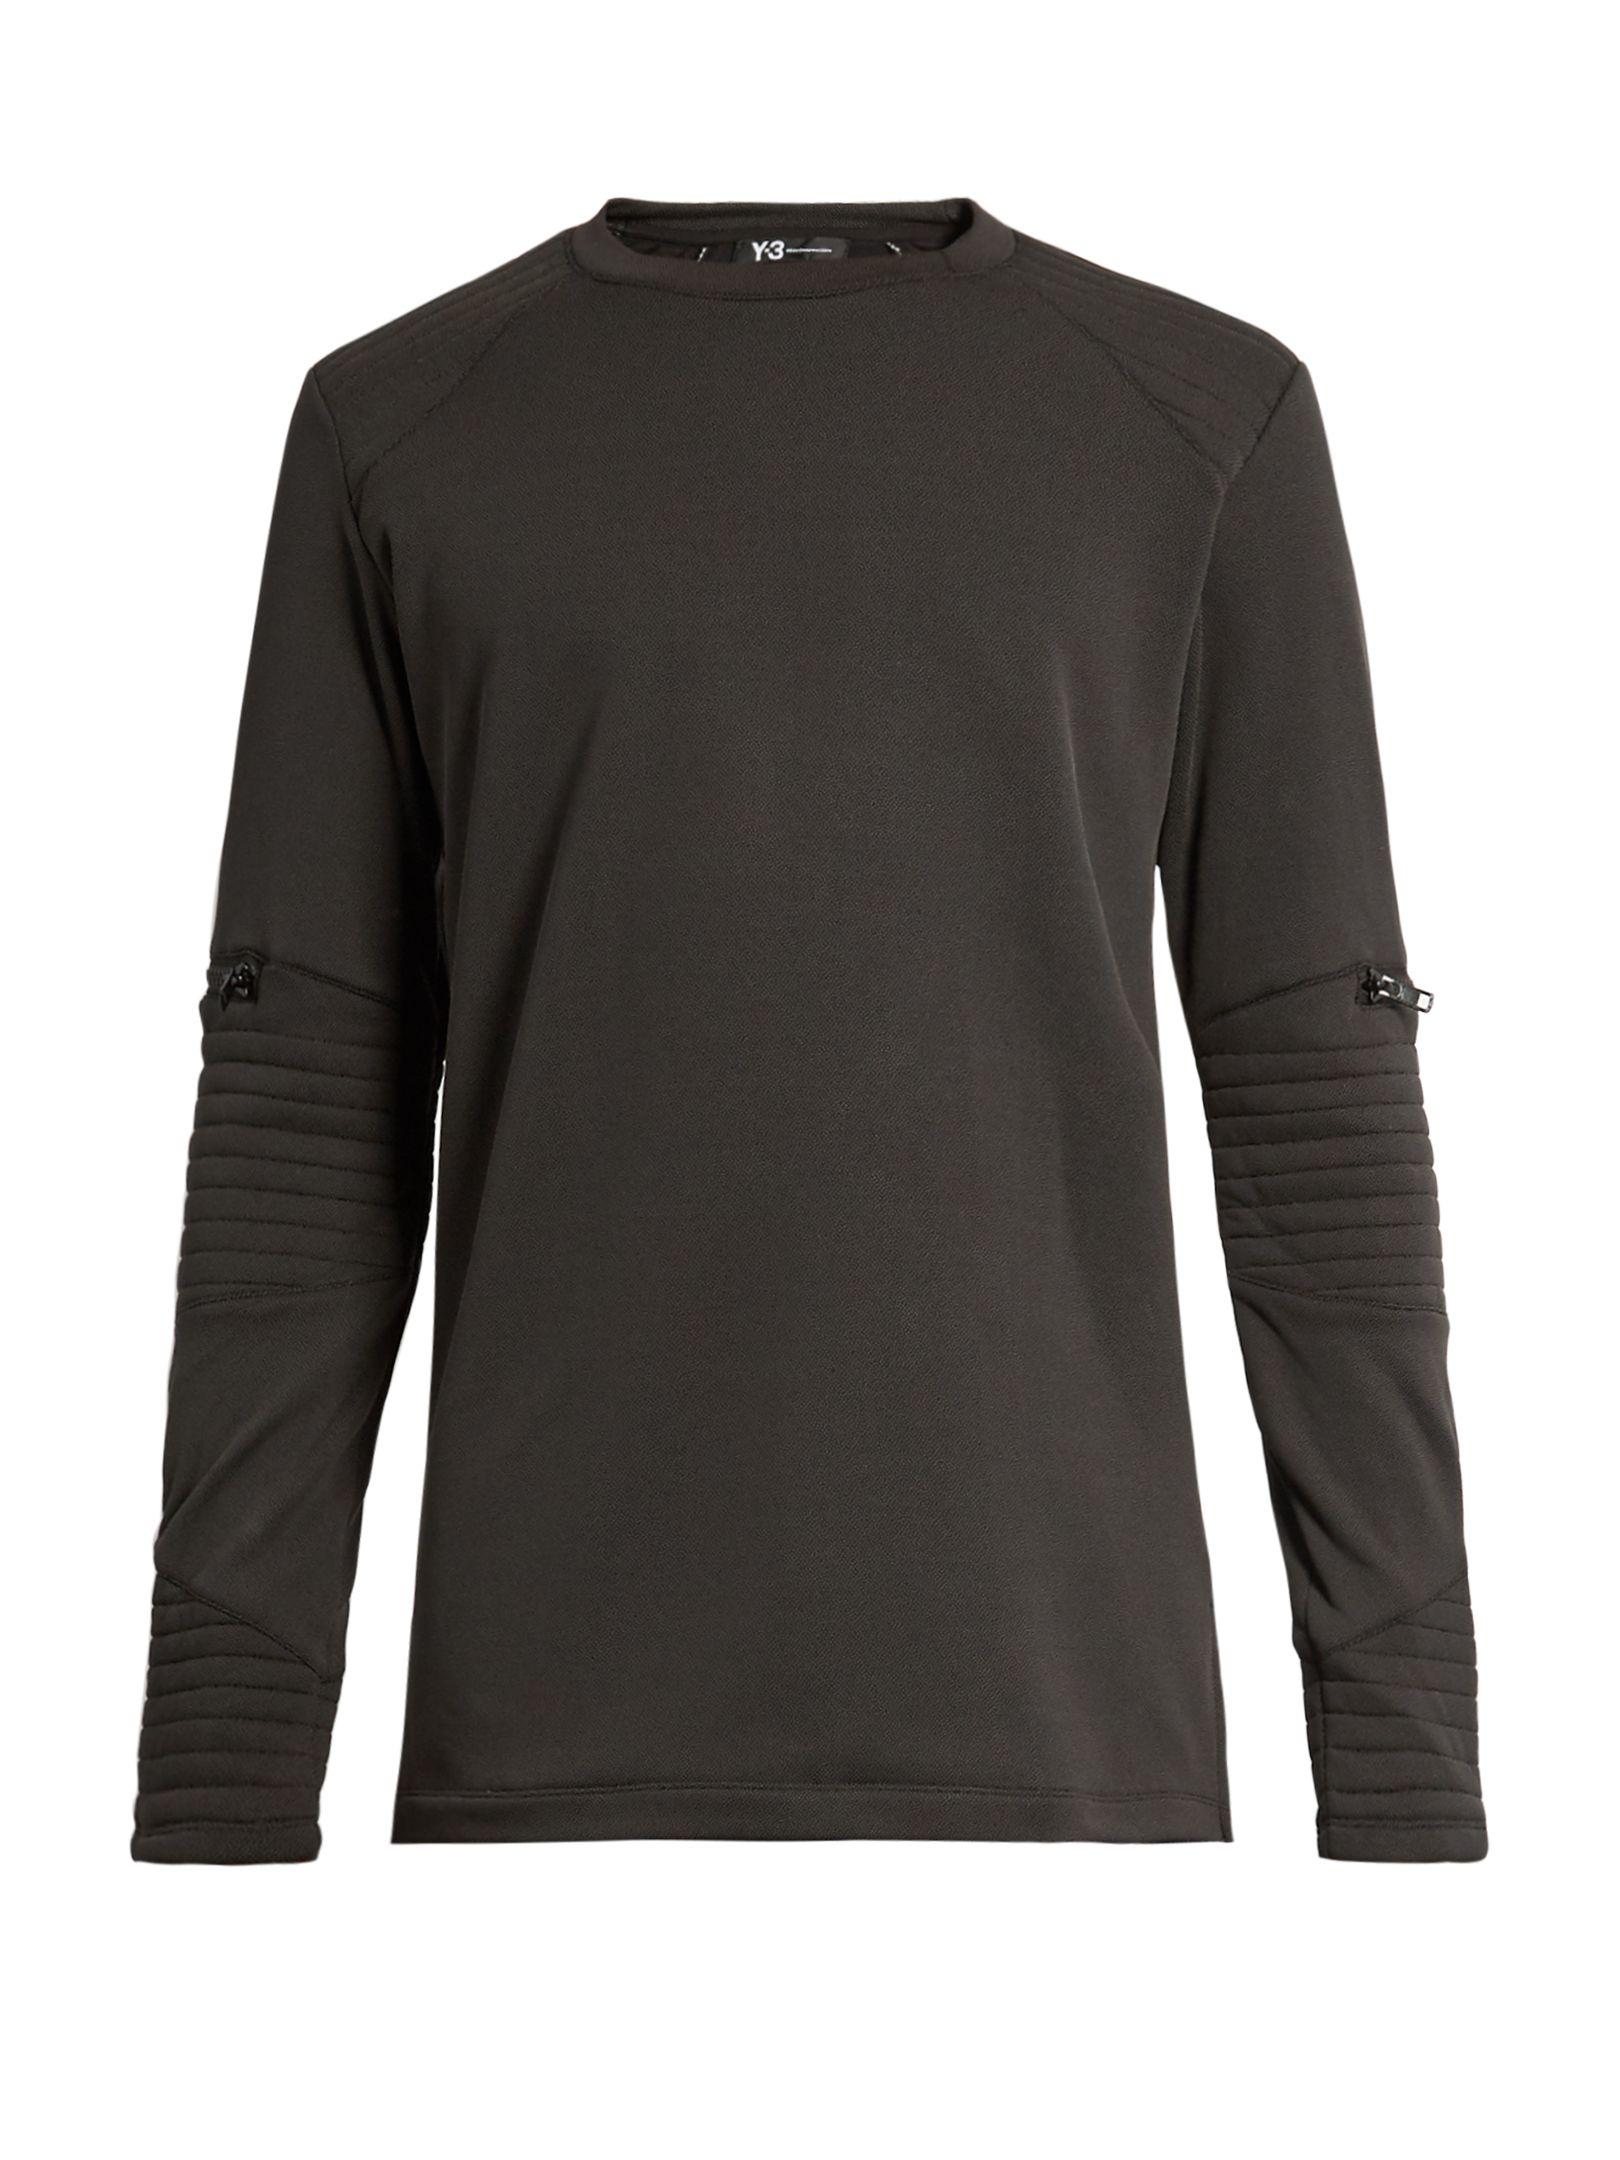 Panelled texturedfleece sweatshirt Y3